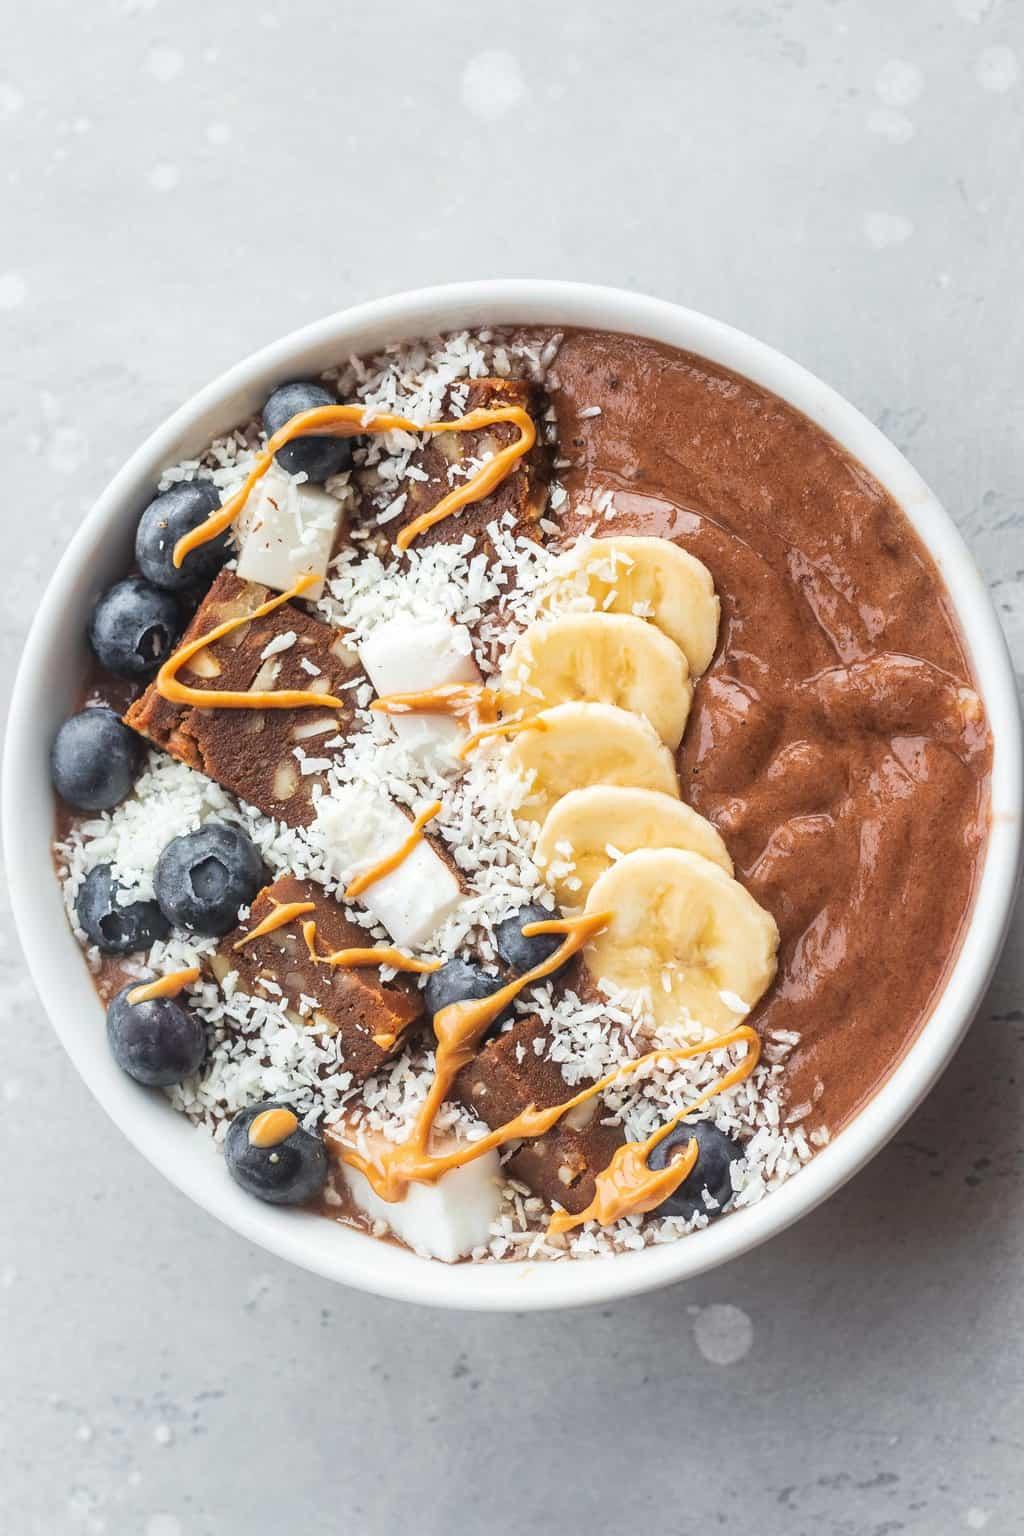 Smoothie bowl with vegan fudge